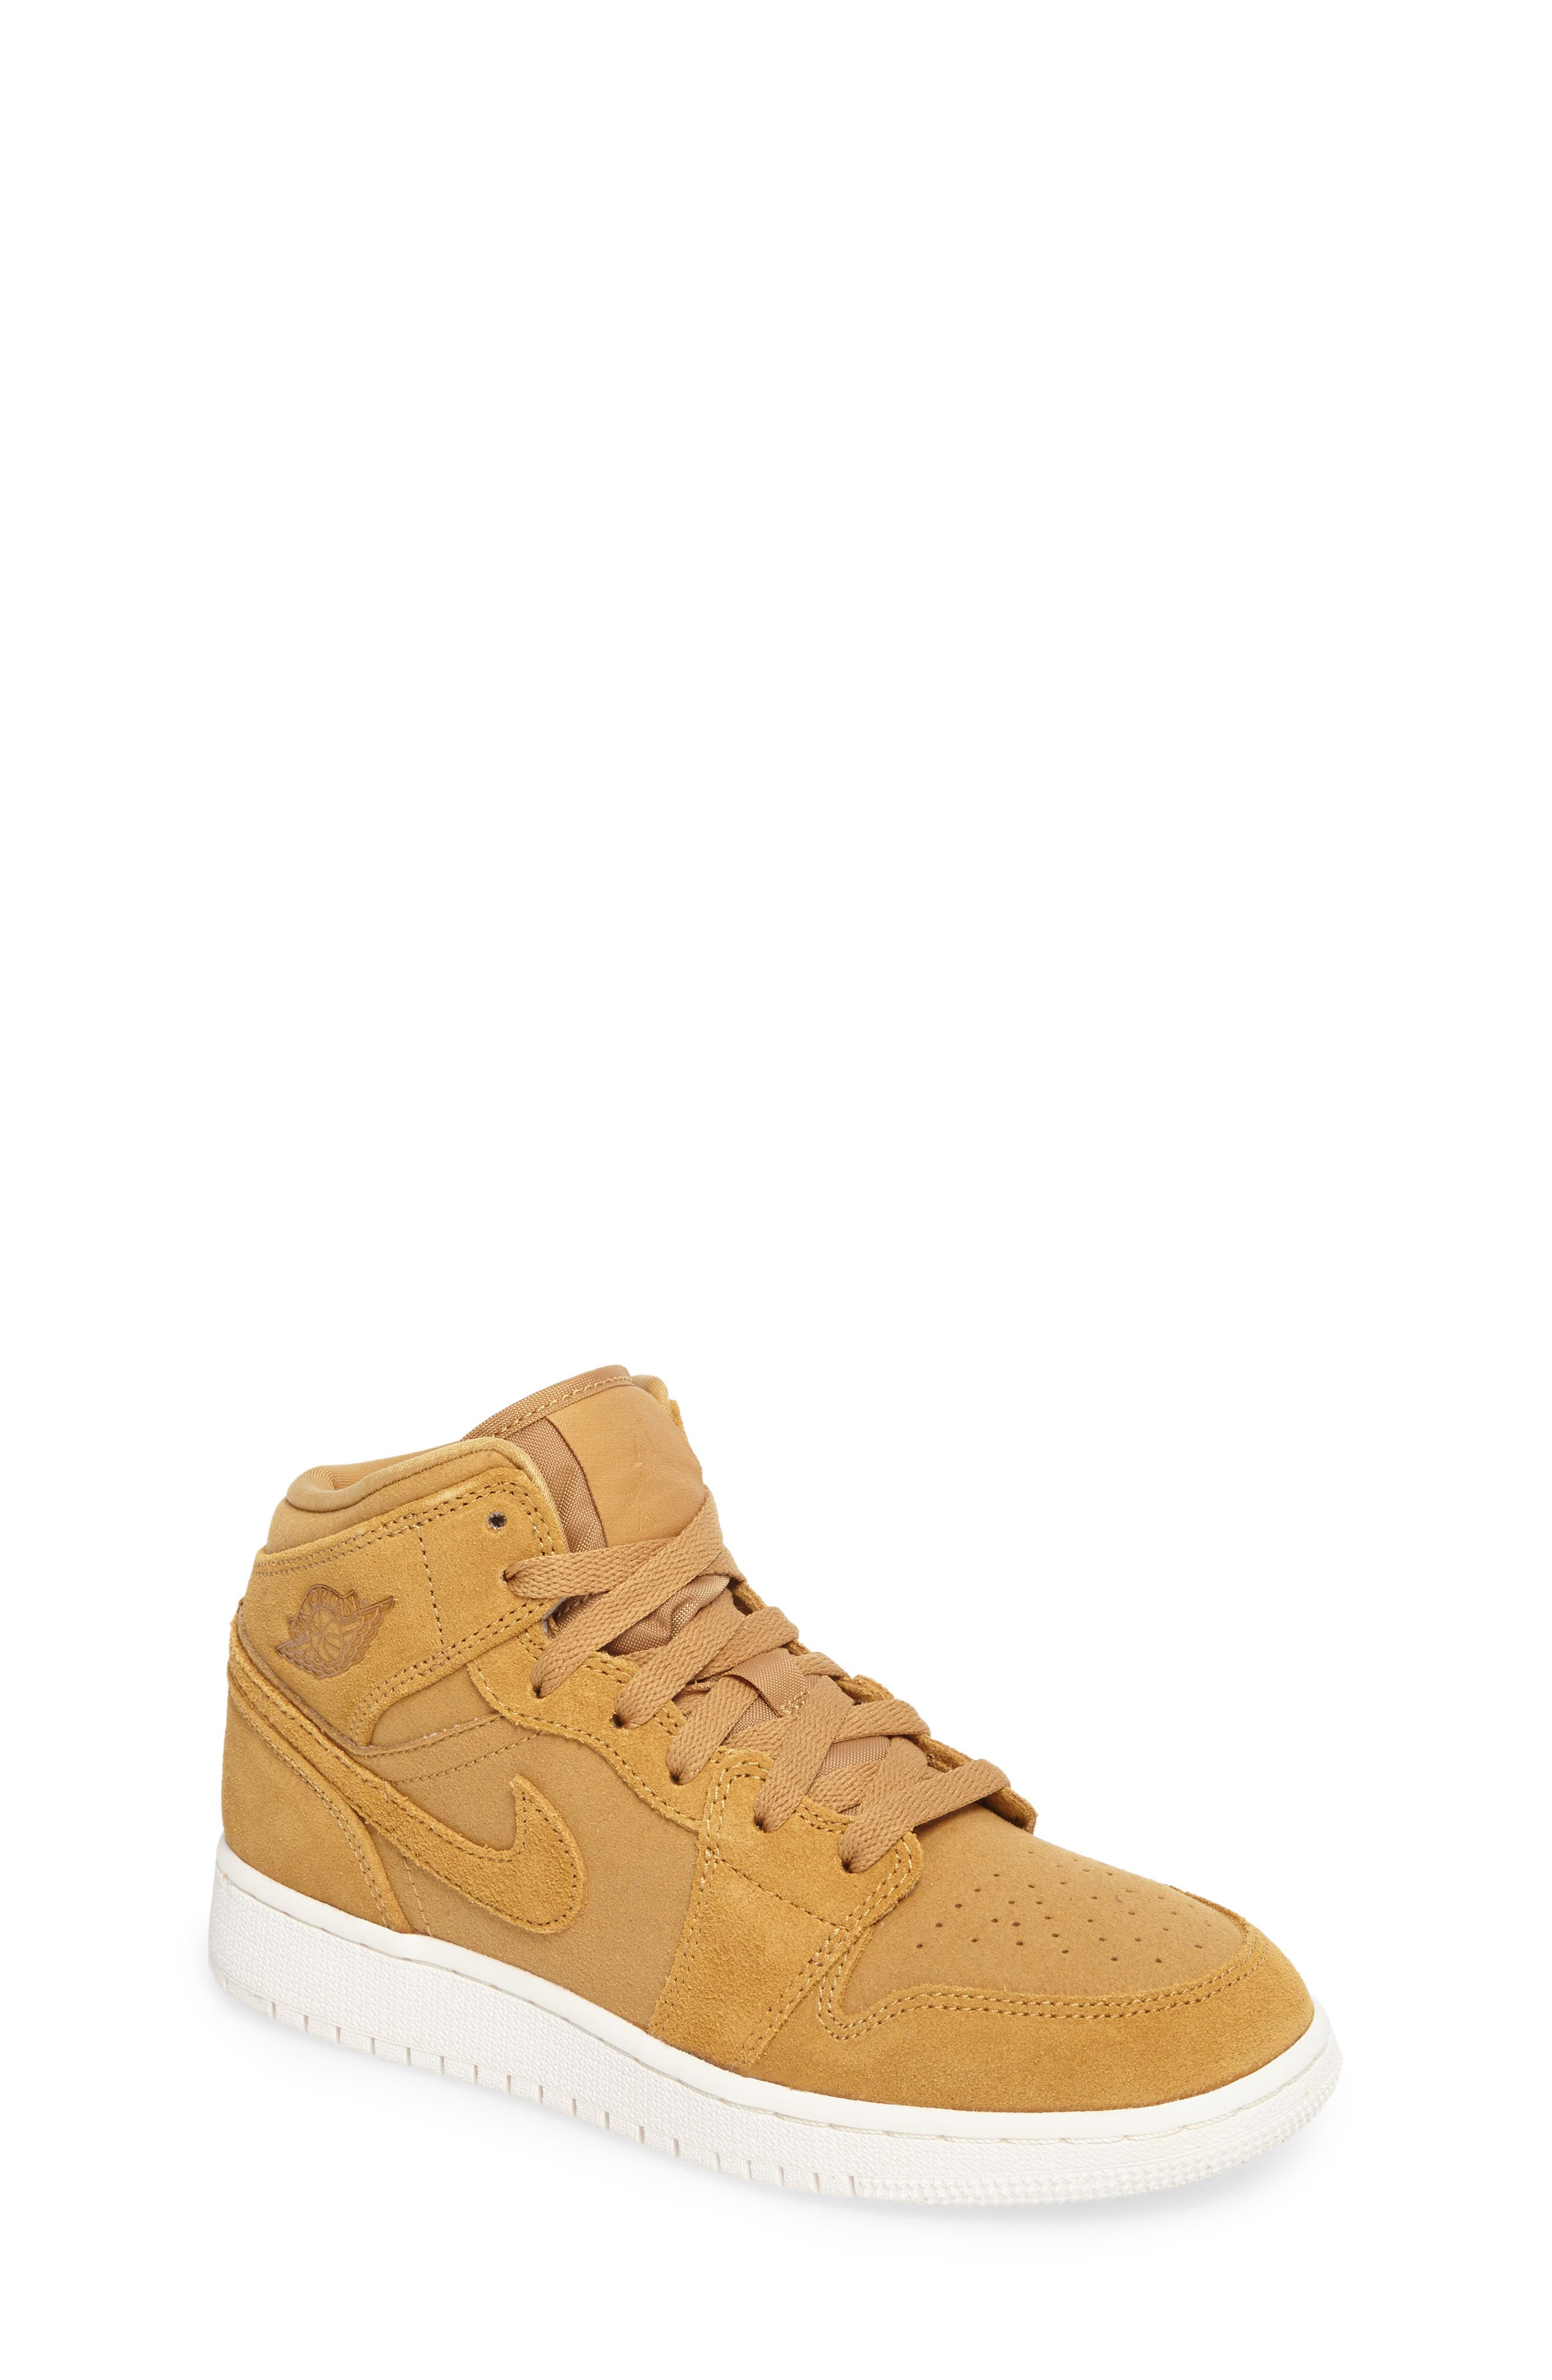 Alternate Image 1 Selected - Nike 'Air Jordan 1 Mid' Sneaker (Big Kid)